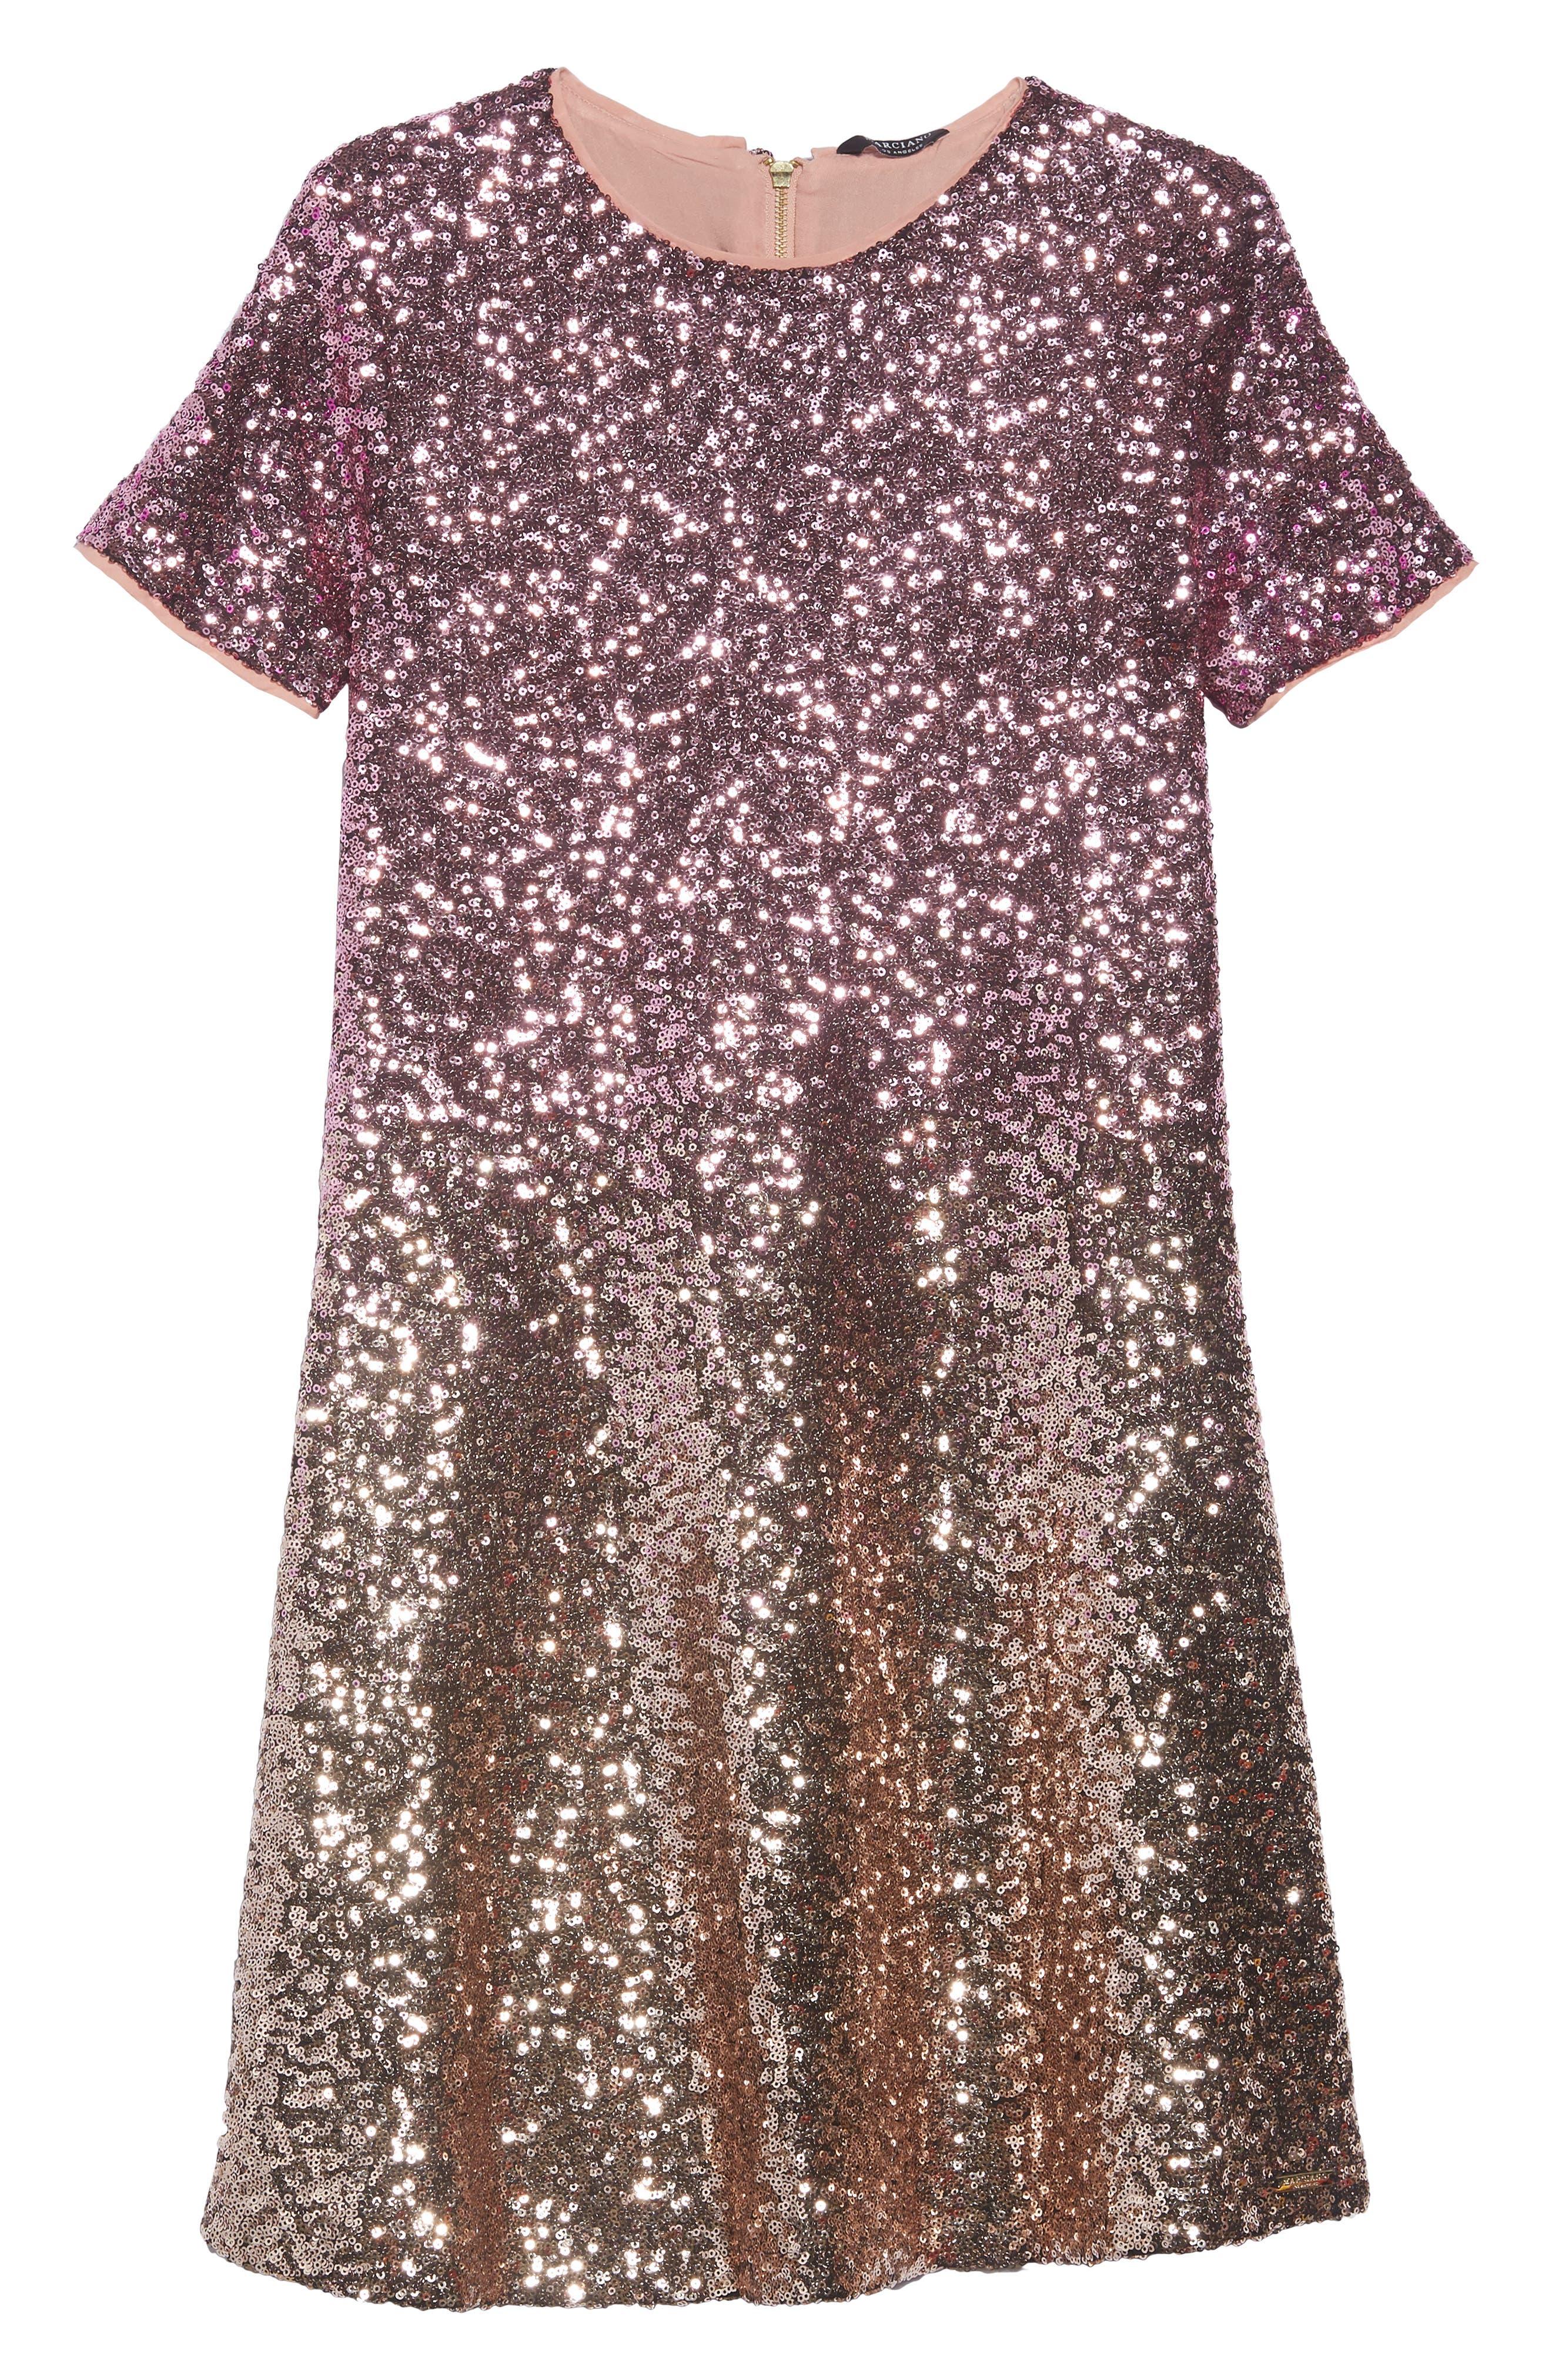 Ombré Sequin Skater Dress,                         Main,                         color, Vanish Gold Sequins